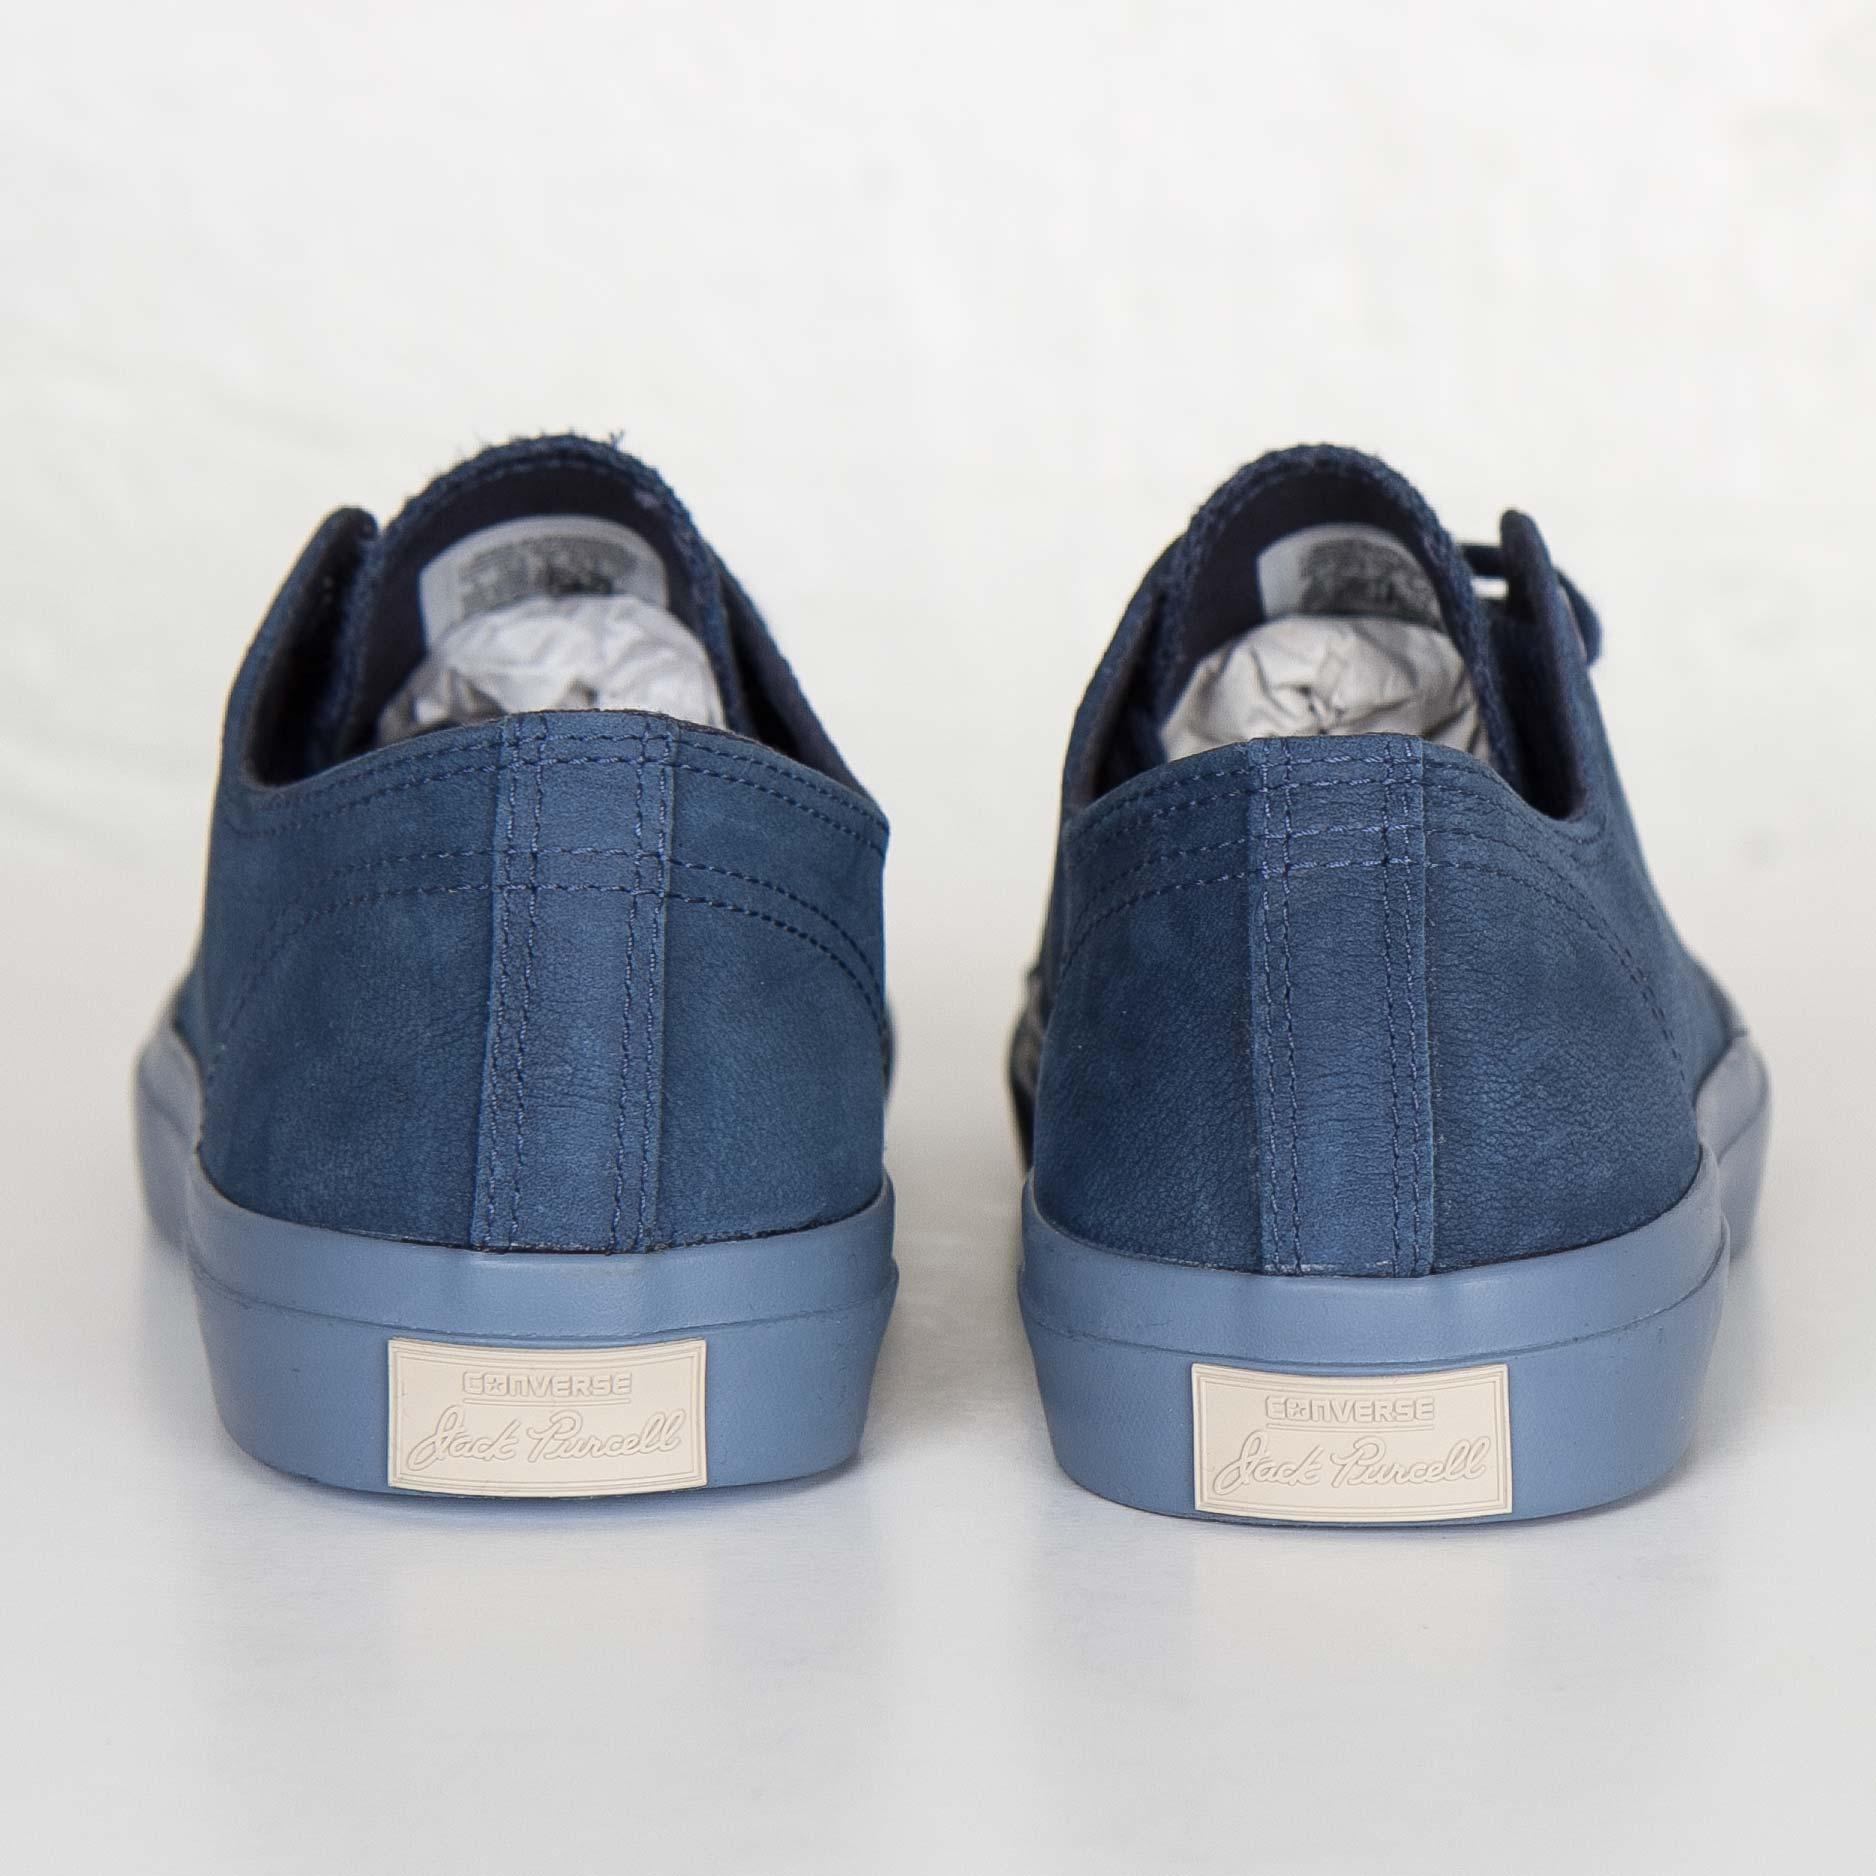 b6275baef807 Converse Jack Purcell Mono - 149922c - Sneakersnstuff